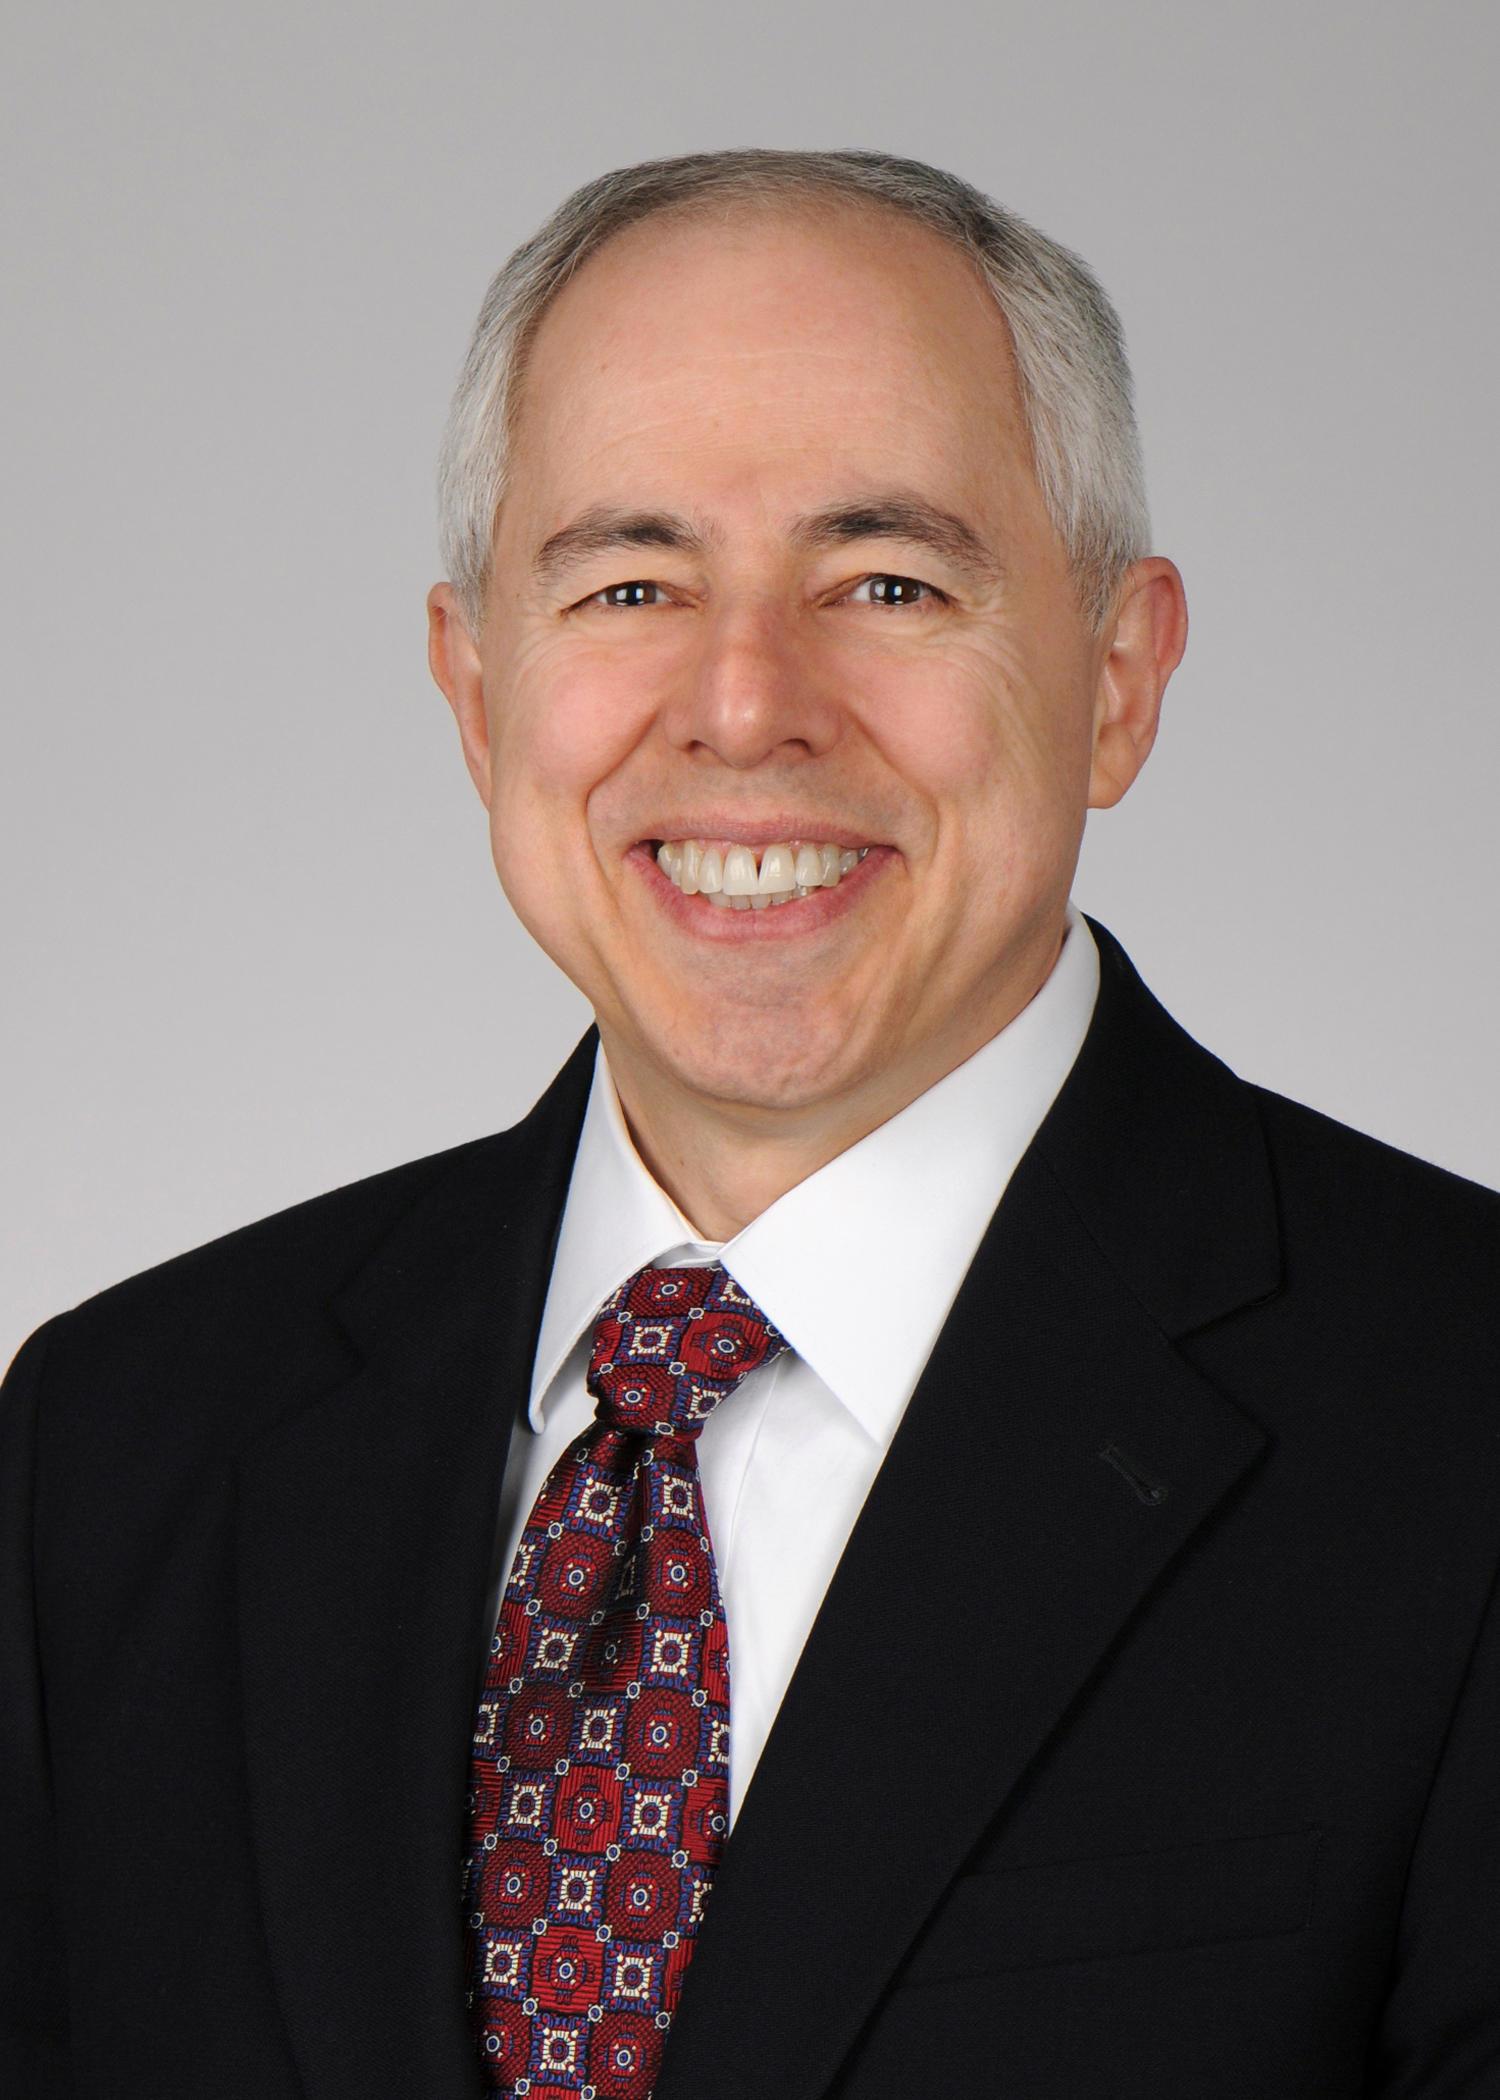 Dirk Michael Elston, MD